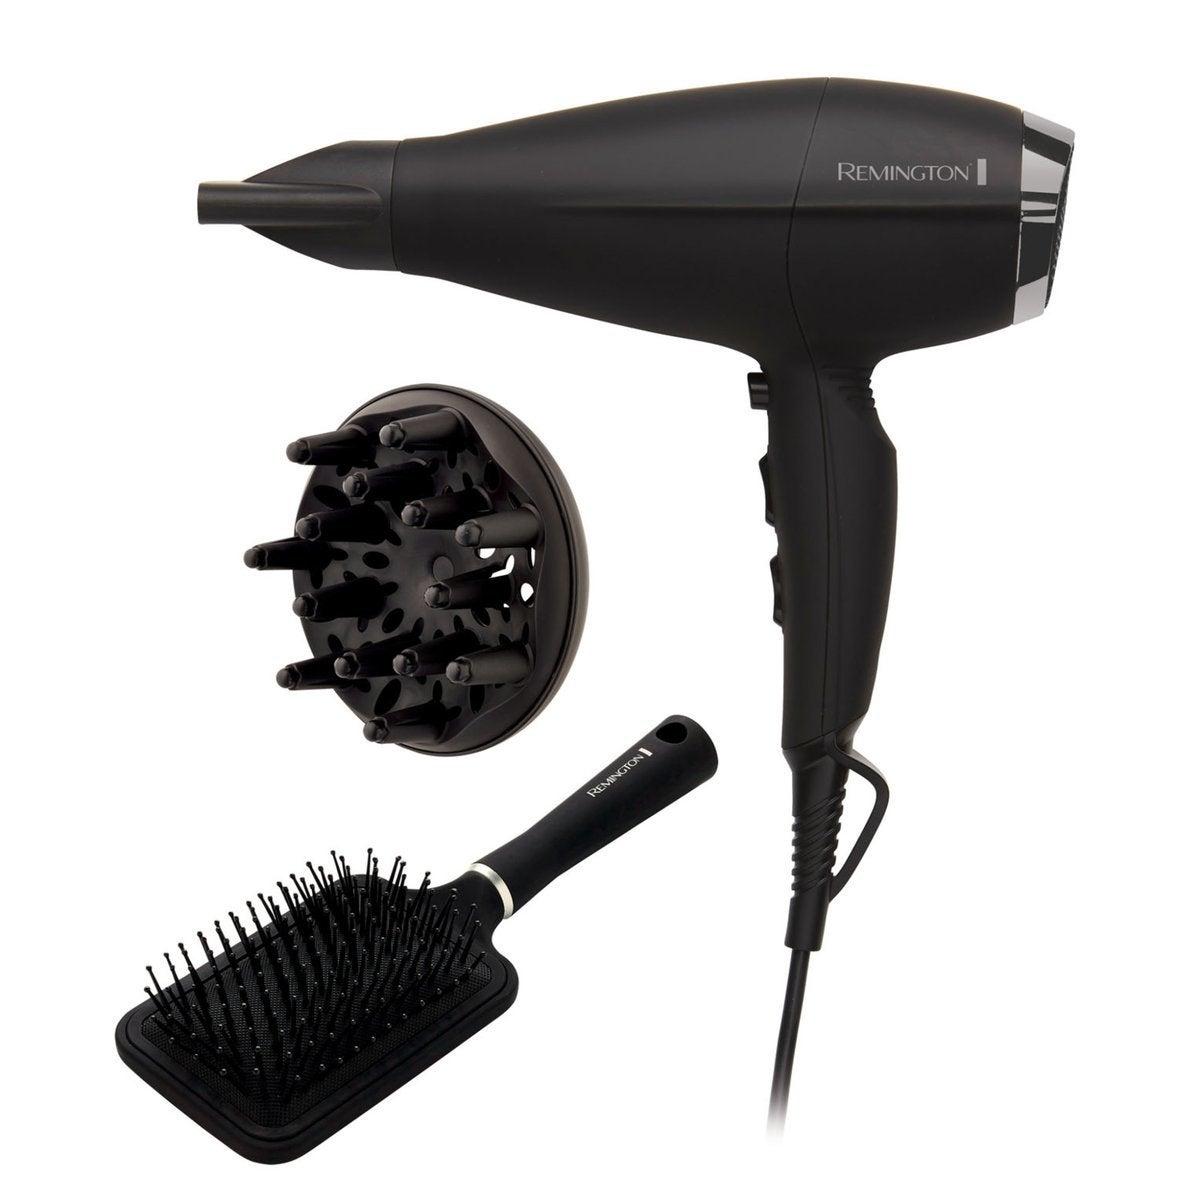 Remington AC4000AU Hair Dryer